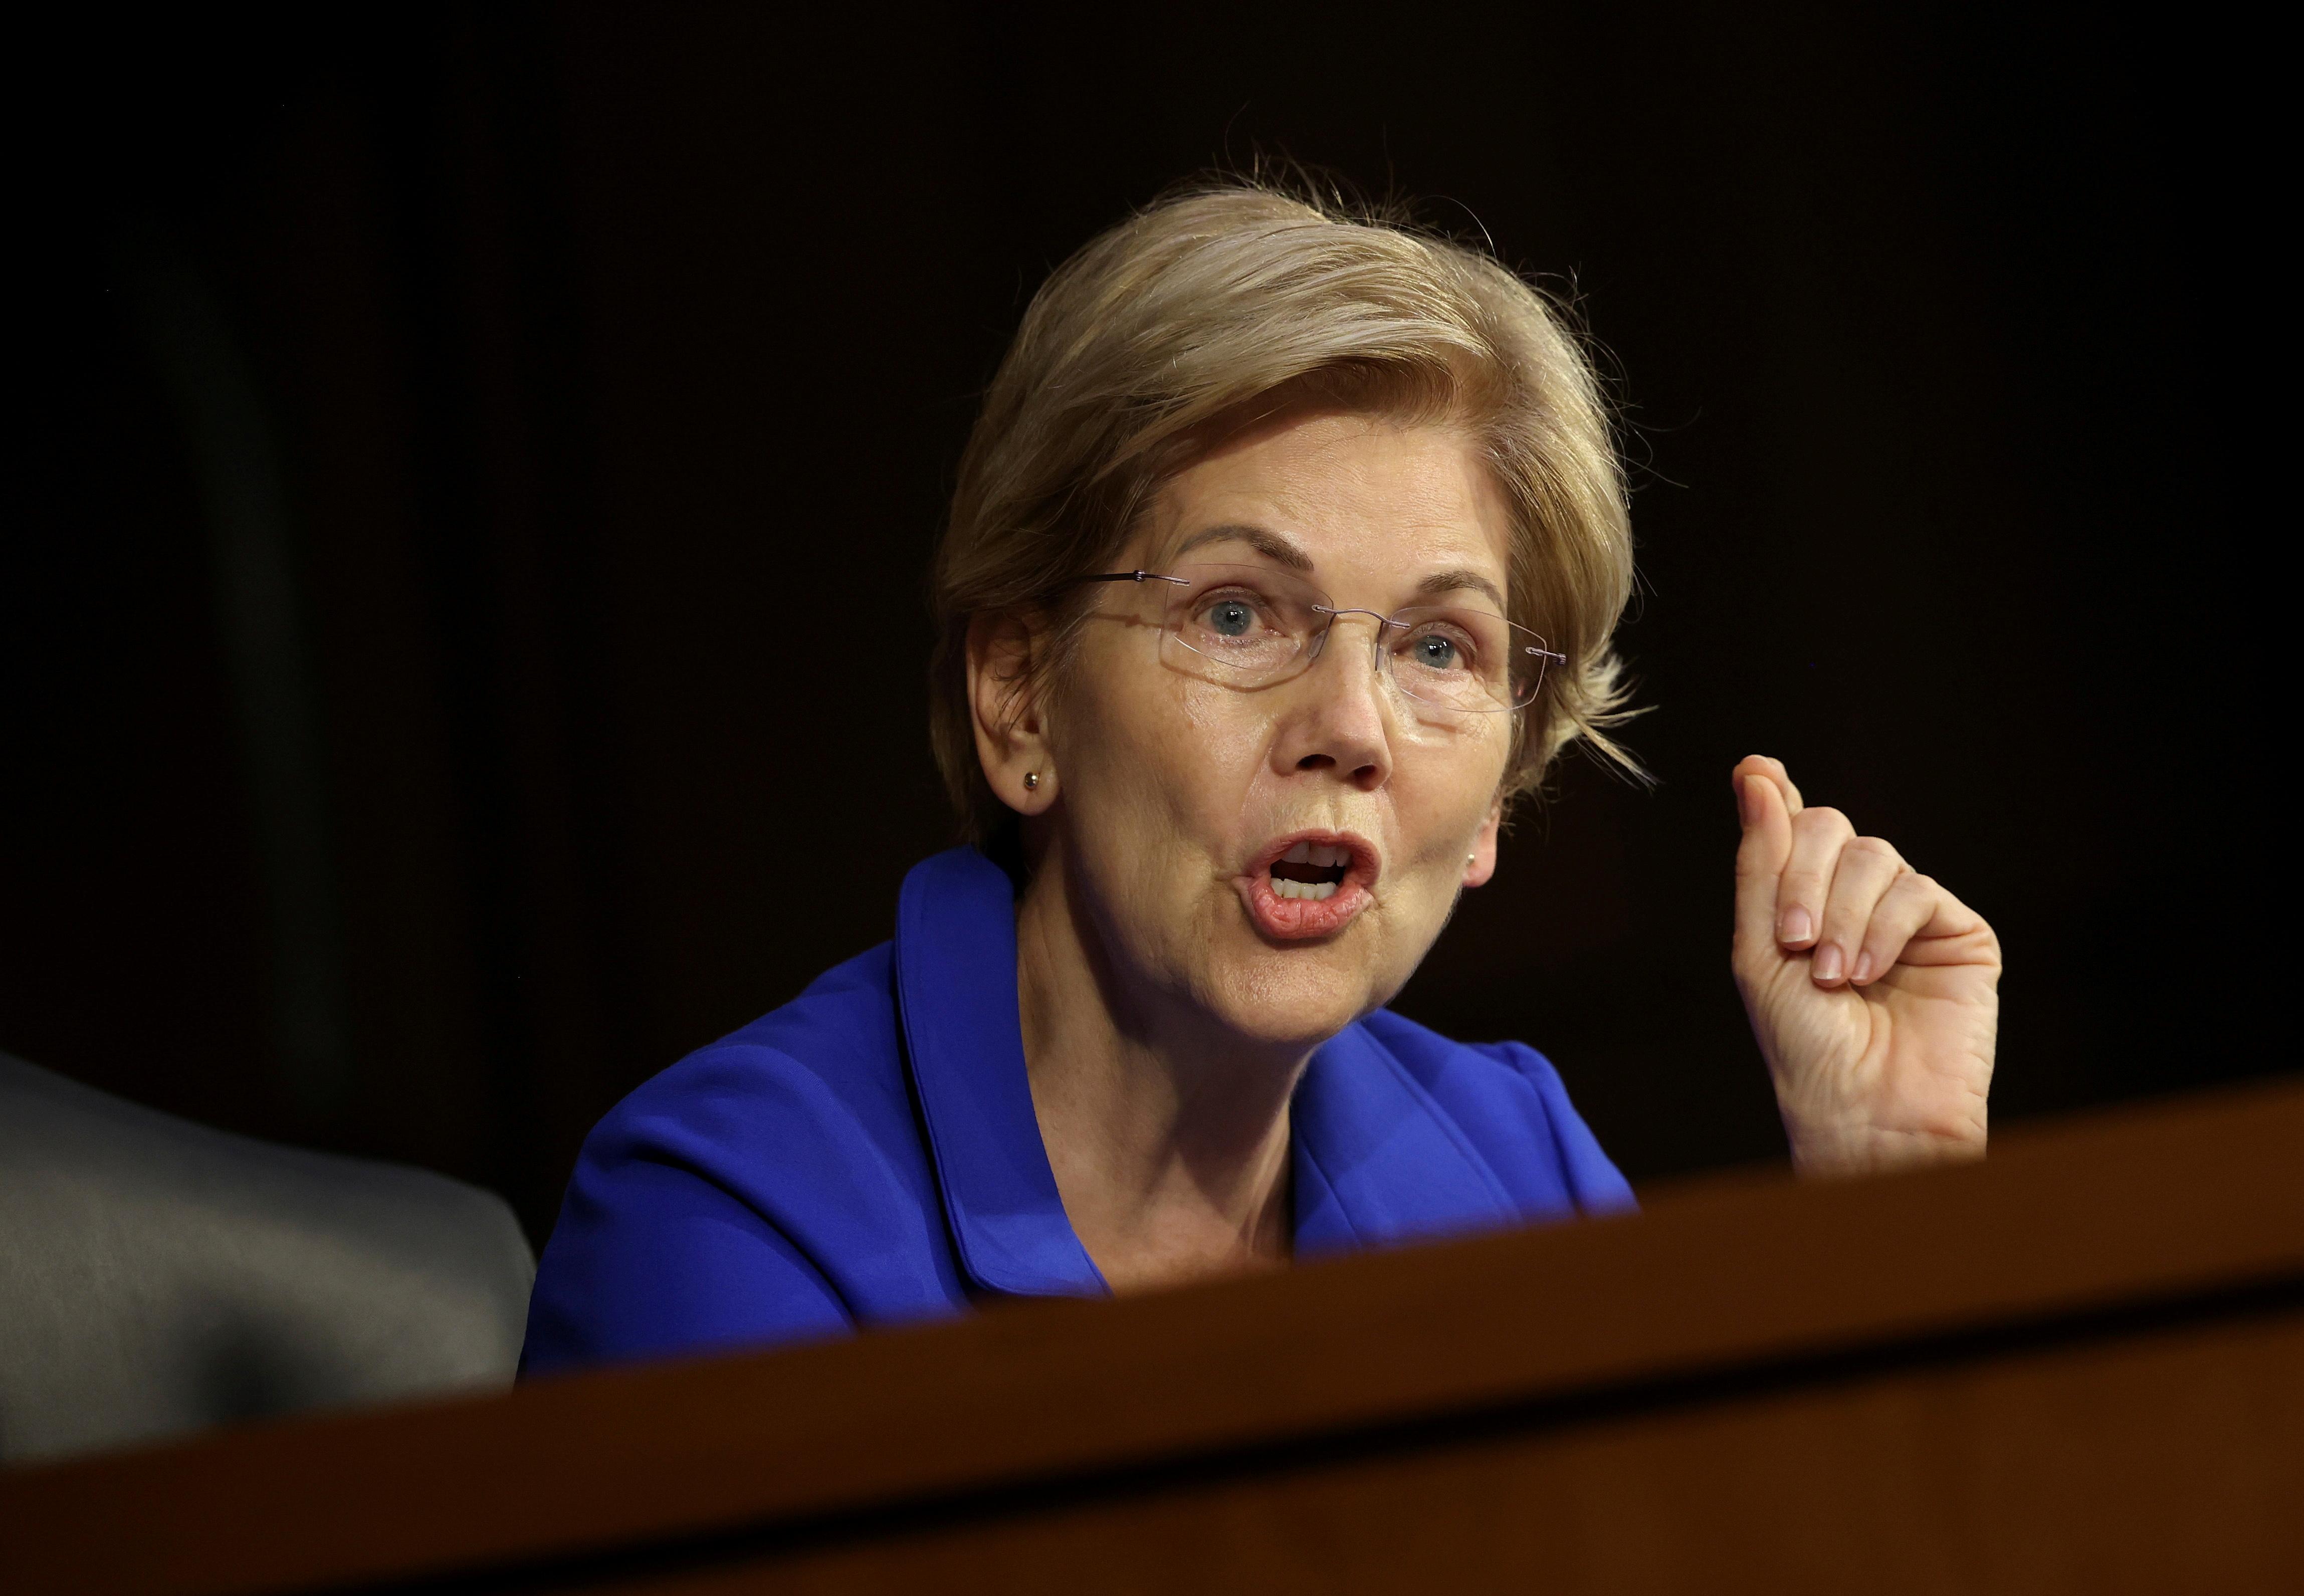 Sen. Elizabeth Warren in a hearing at the Hart Senate Office Building in Washington, DC. September 28, 2021. Kevin Dietsch/Pool via REUTERS/